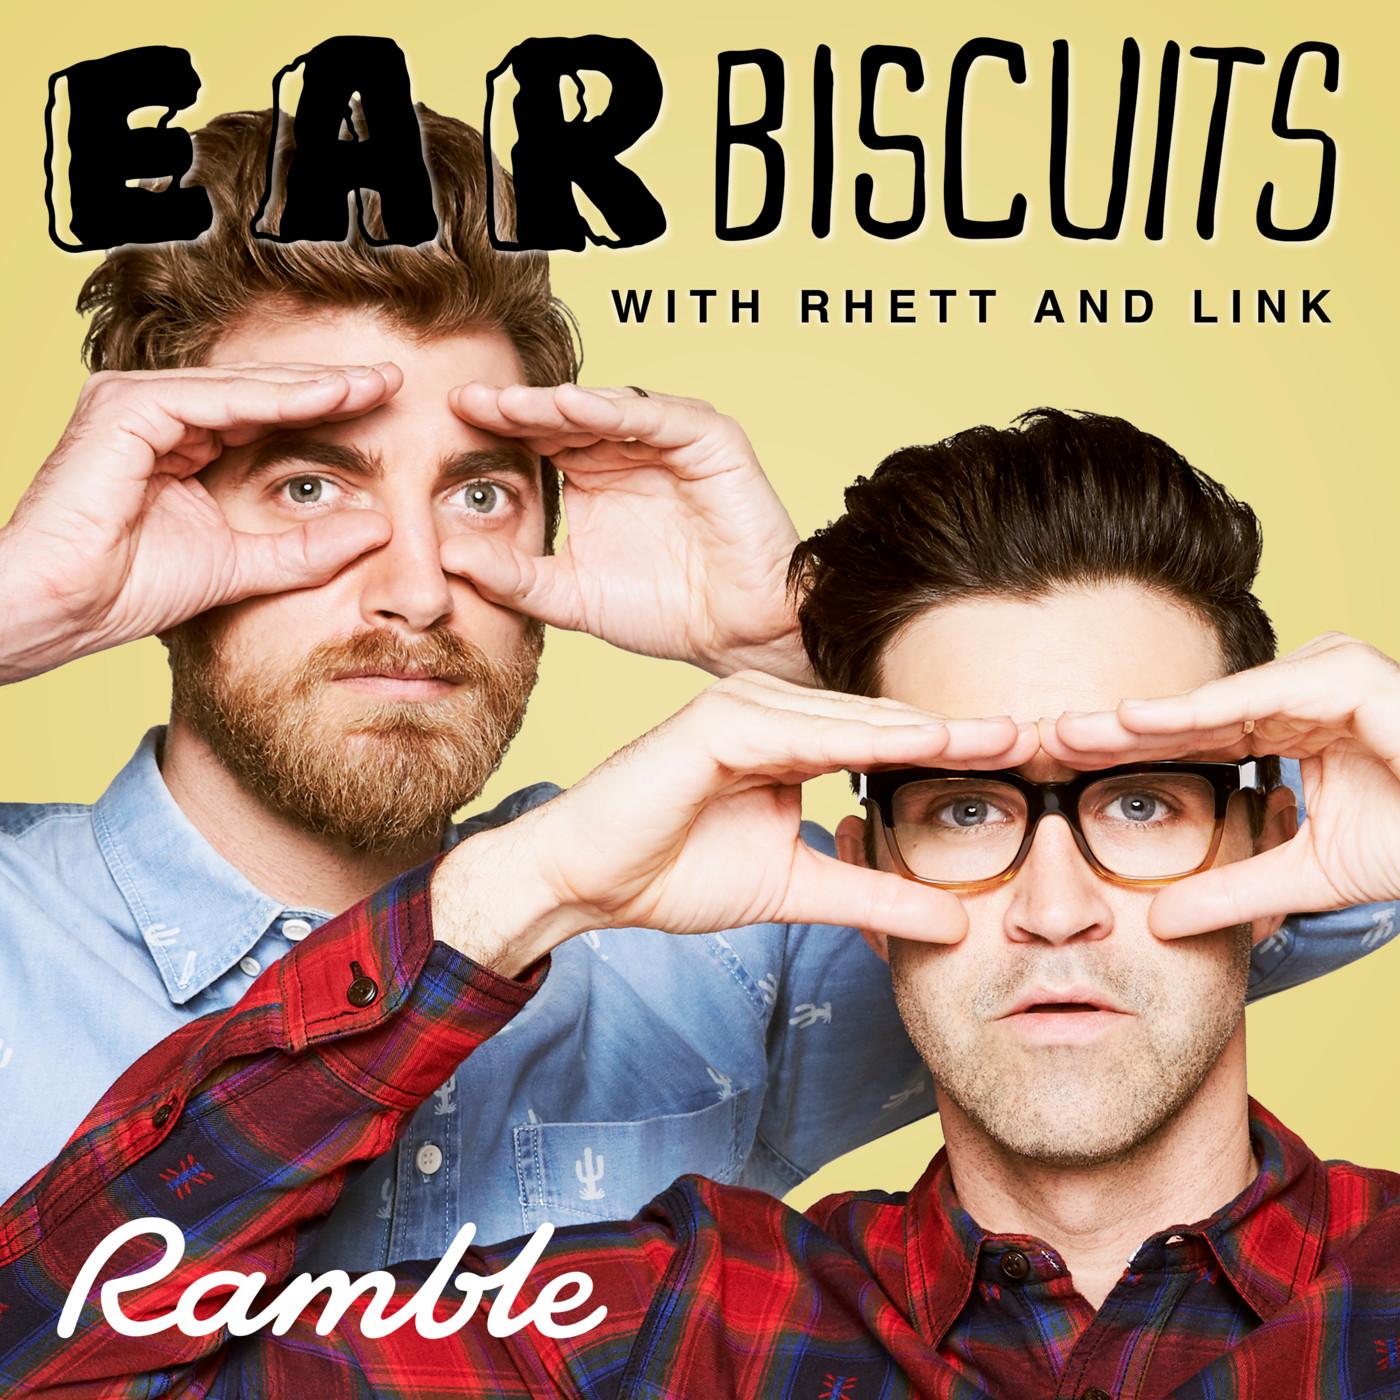 c7d89f24feec Ear Biscuits